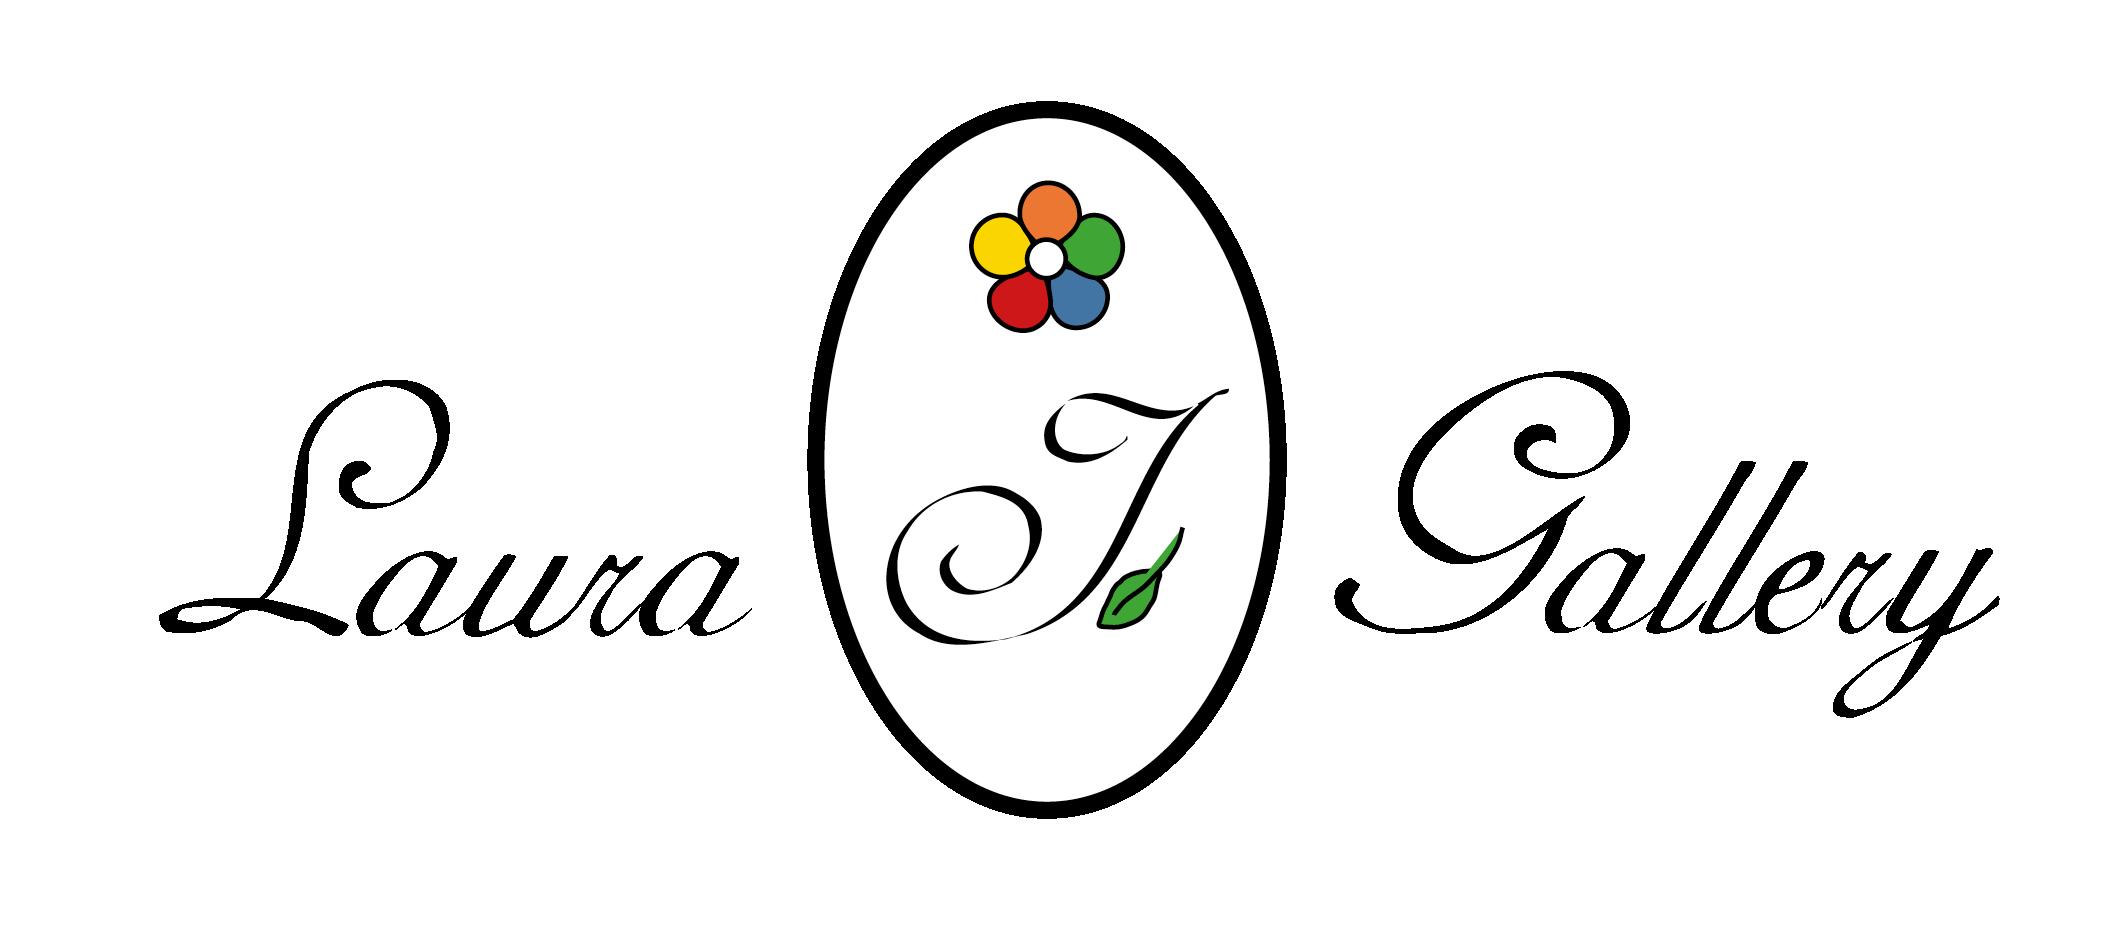 Laura I.Gallery